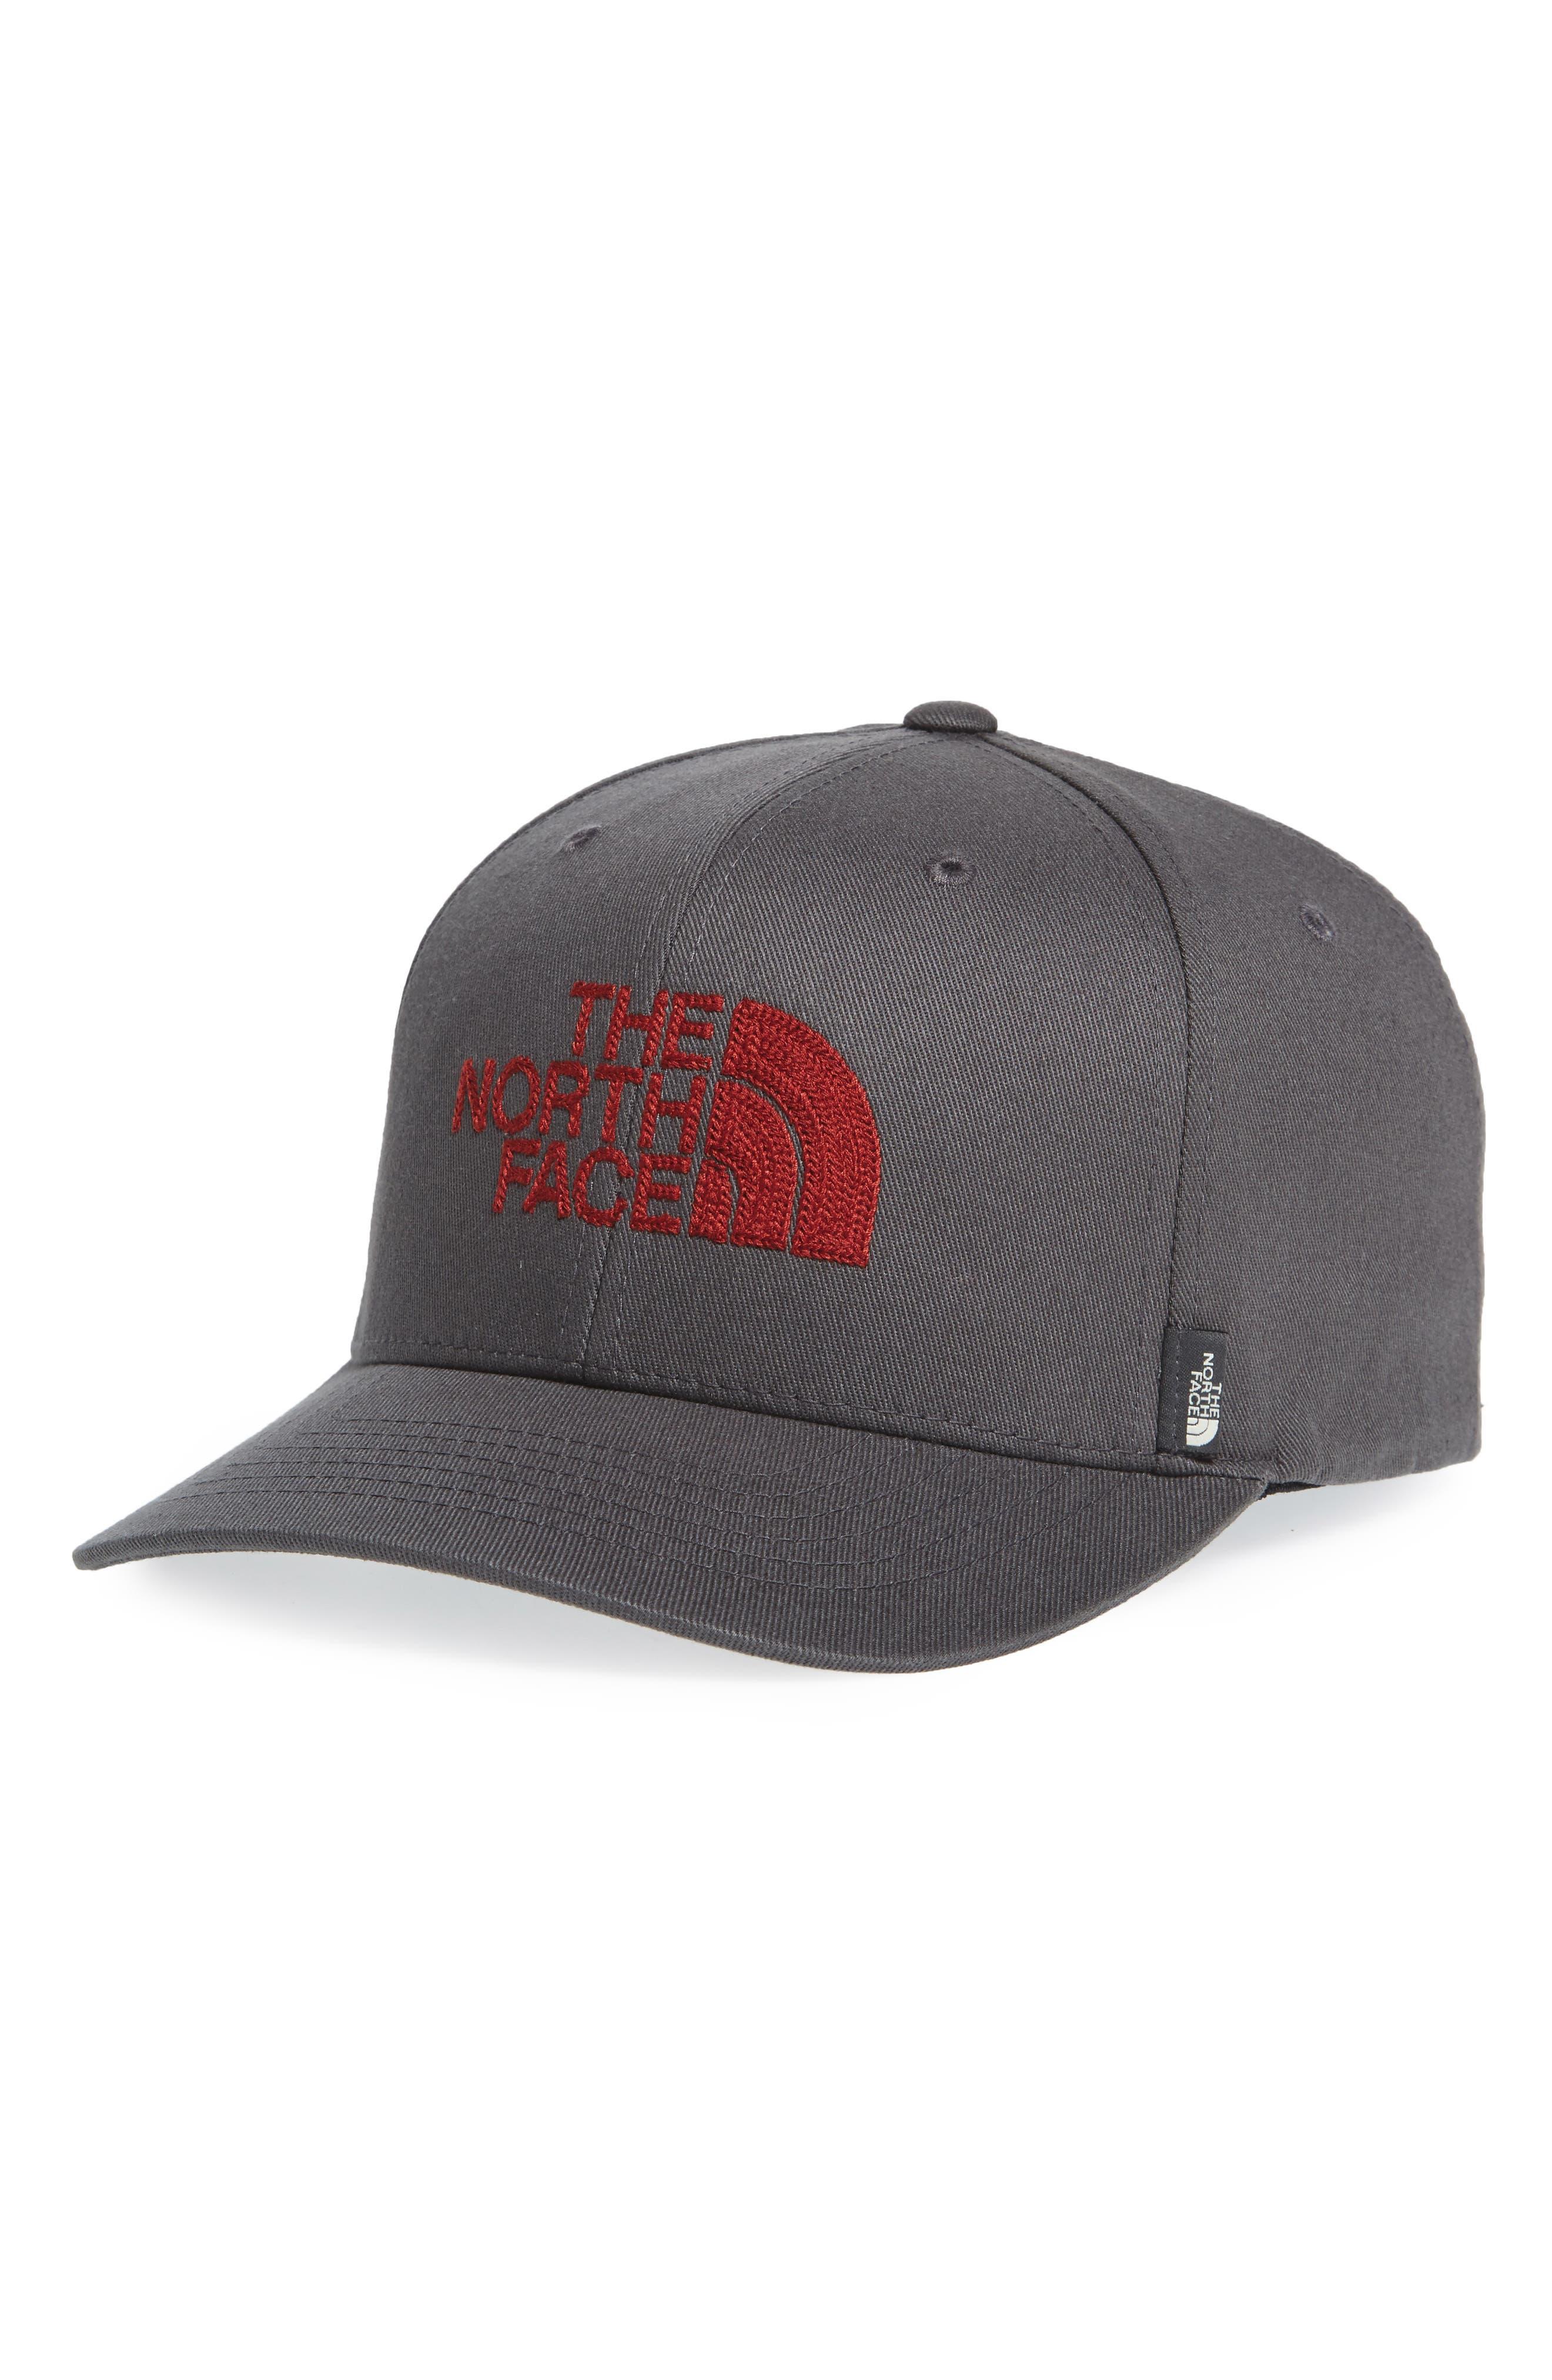 Never Stop Exploring Baseball Cap,                         Main,                         color, 021